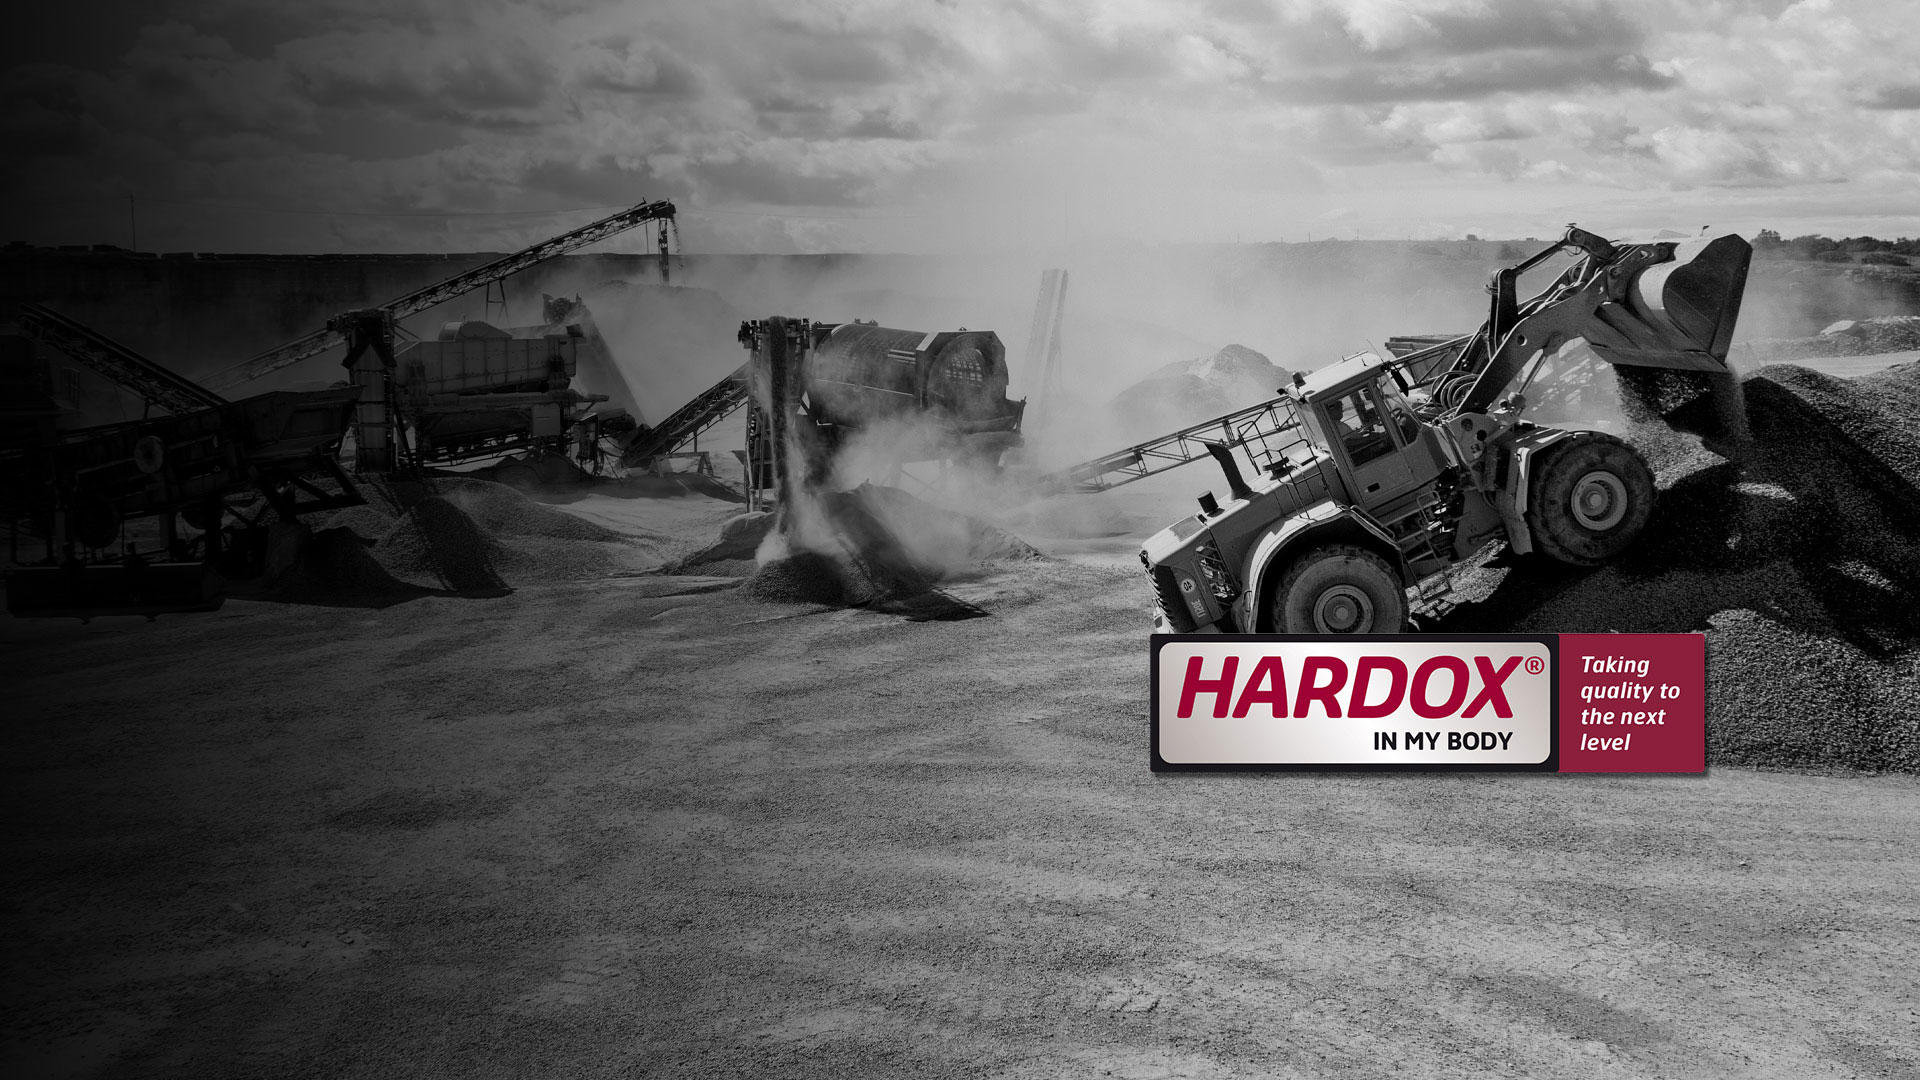 Hardox In My Bodyのメリット